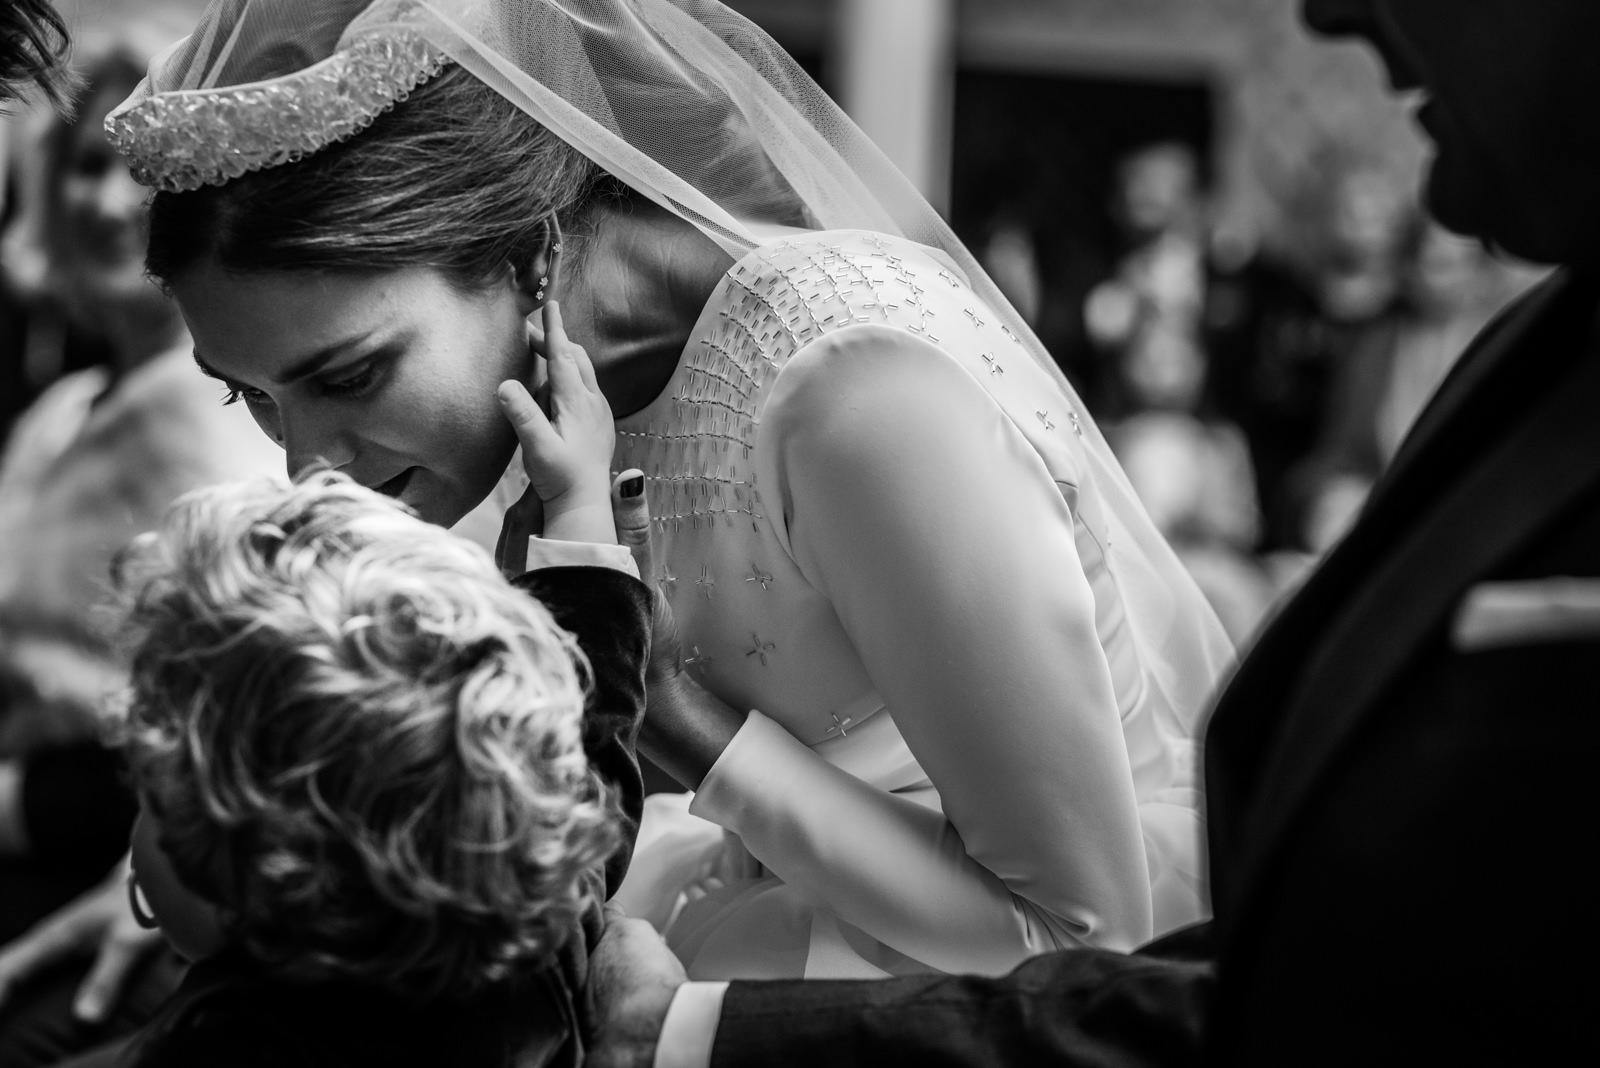 Wedroads-Boda-Sevilla-Parador-Carmona-bridal-engagement-Rafael-Torres-fotografo-bodas-sevilla-madrid-barcelona-wedding-photographer--36.jpg